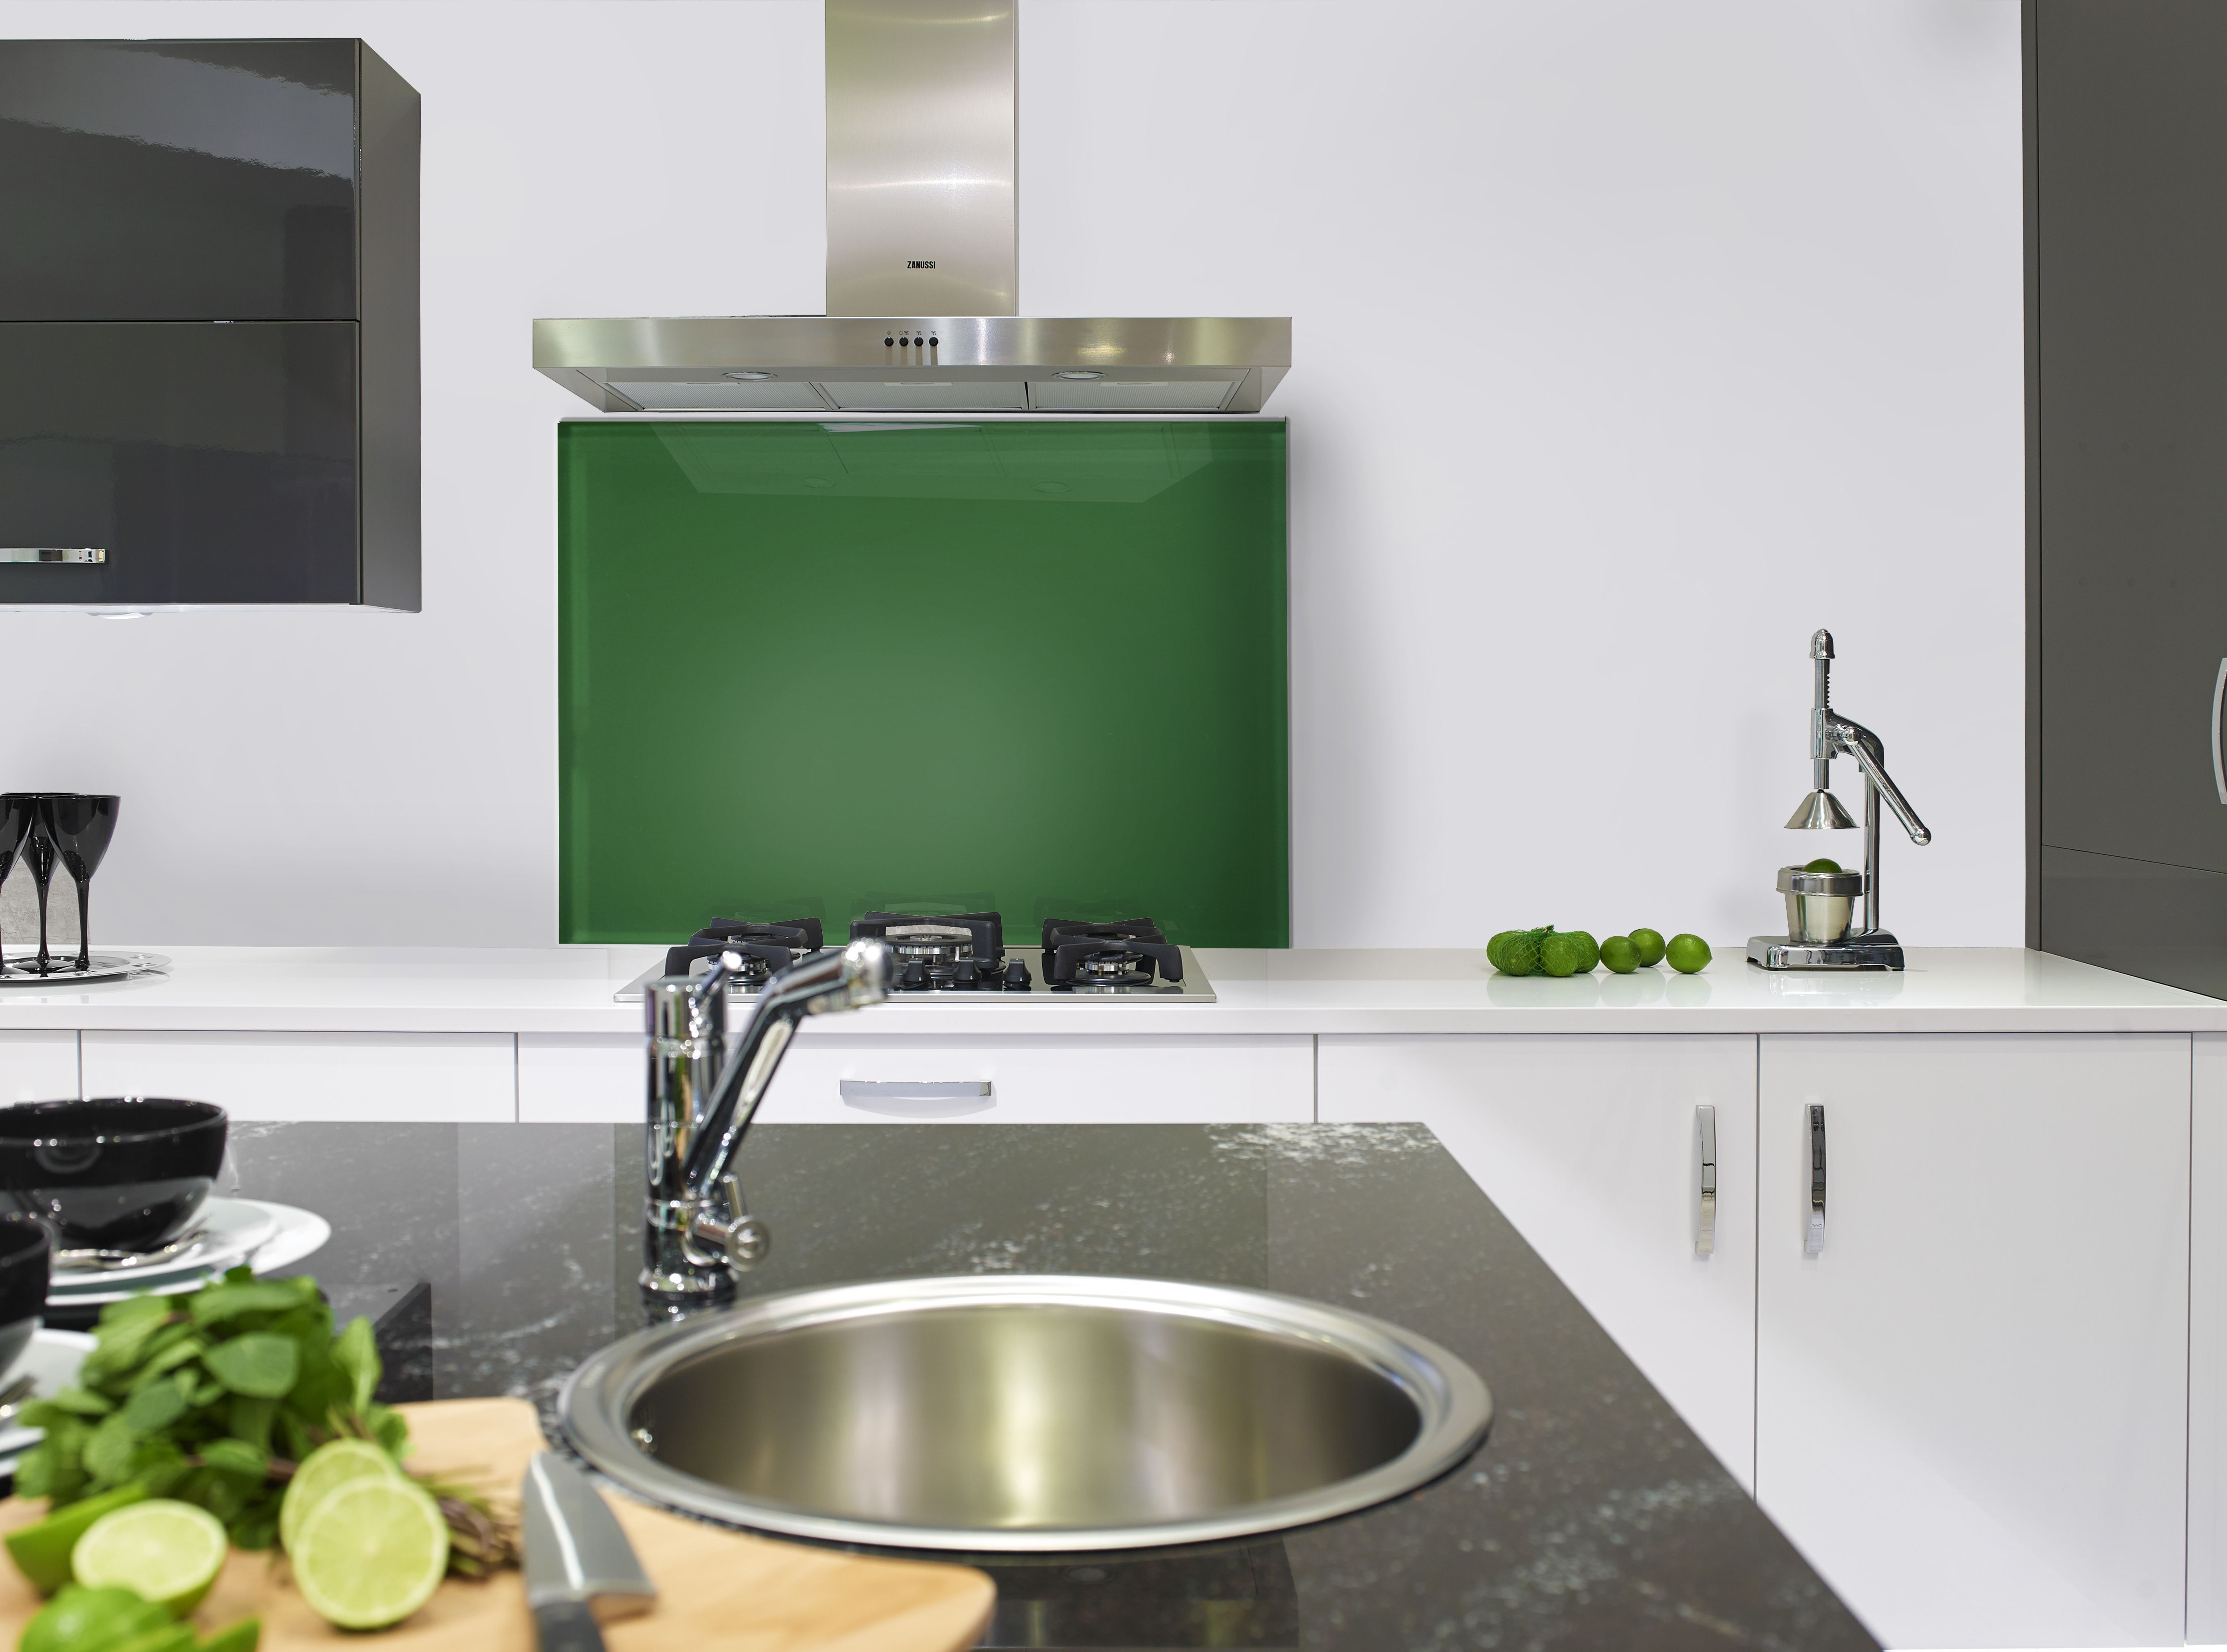 Splashback For Kitchens 85 Best Images About Kitchen Splashback Ideas On Pinterest